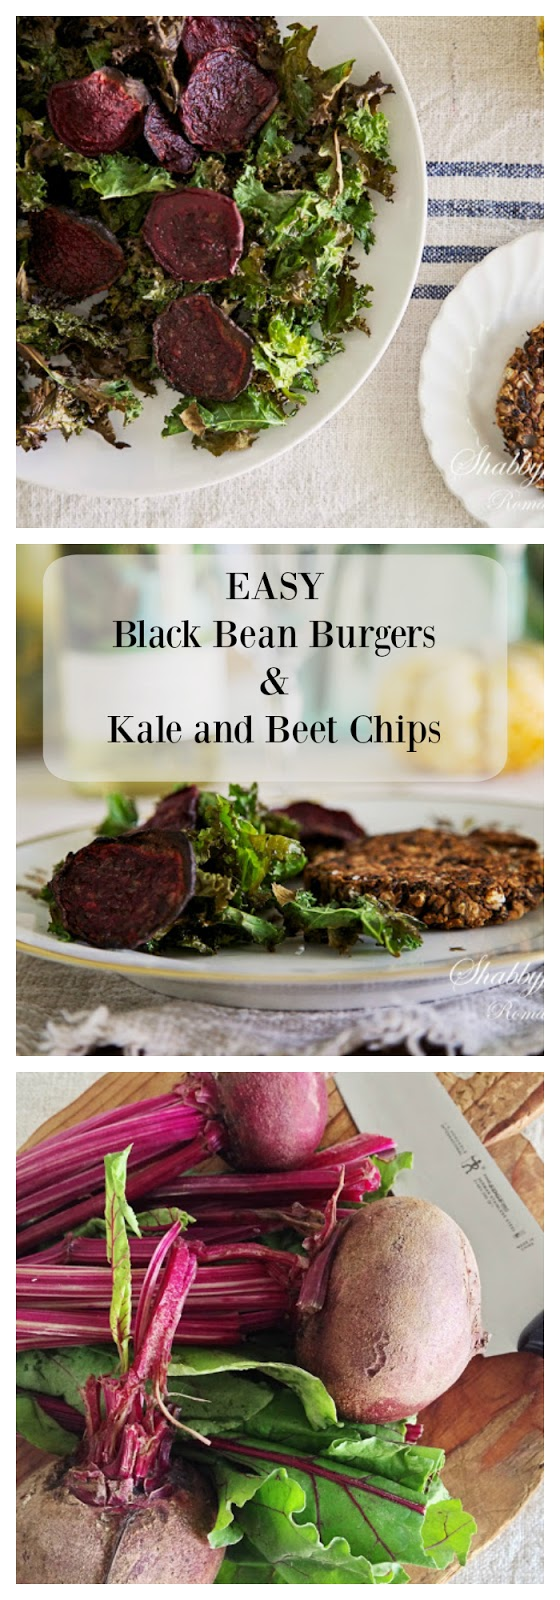 black-bean-burgers-kale-beet-chips